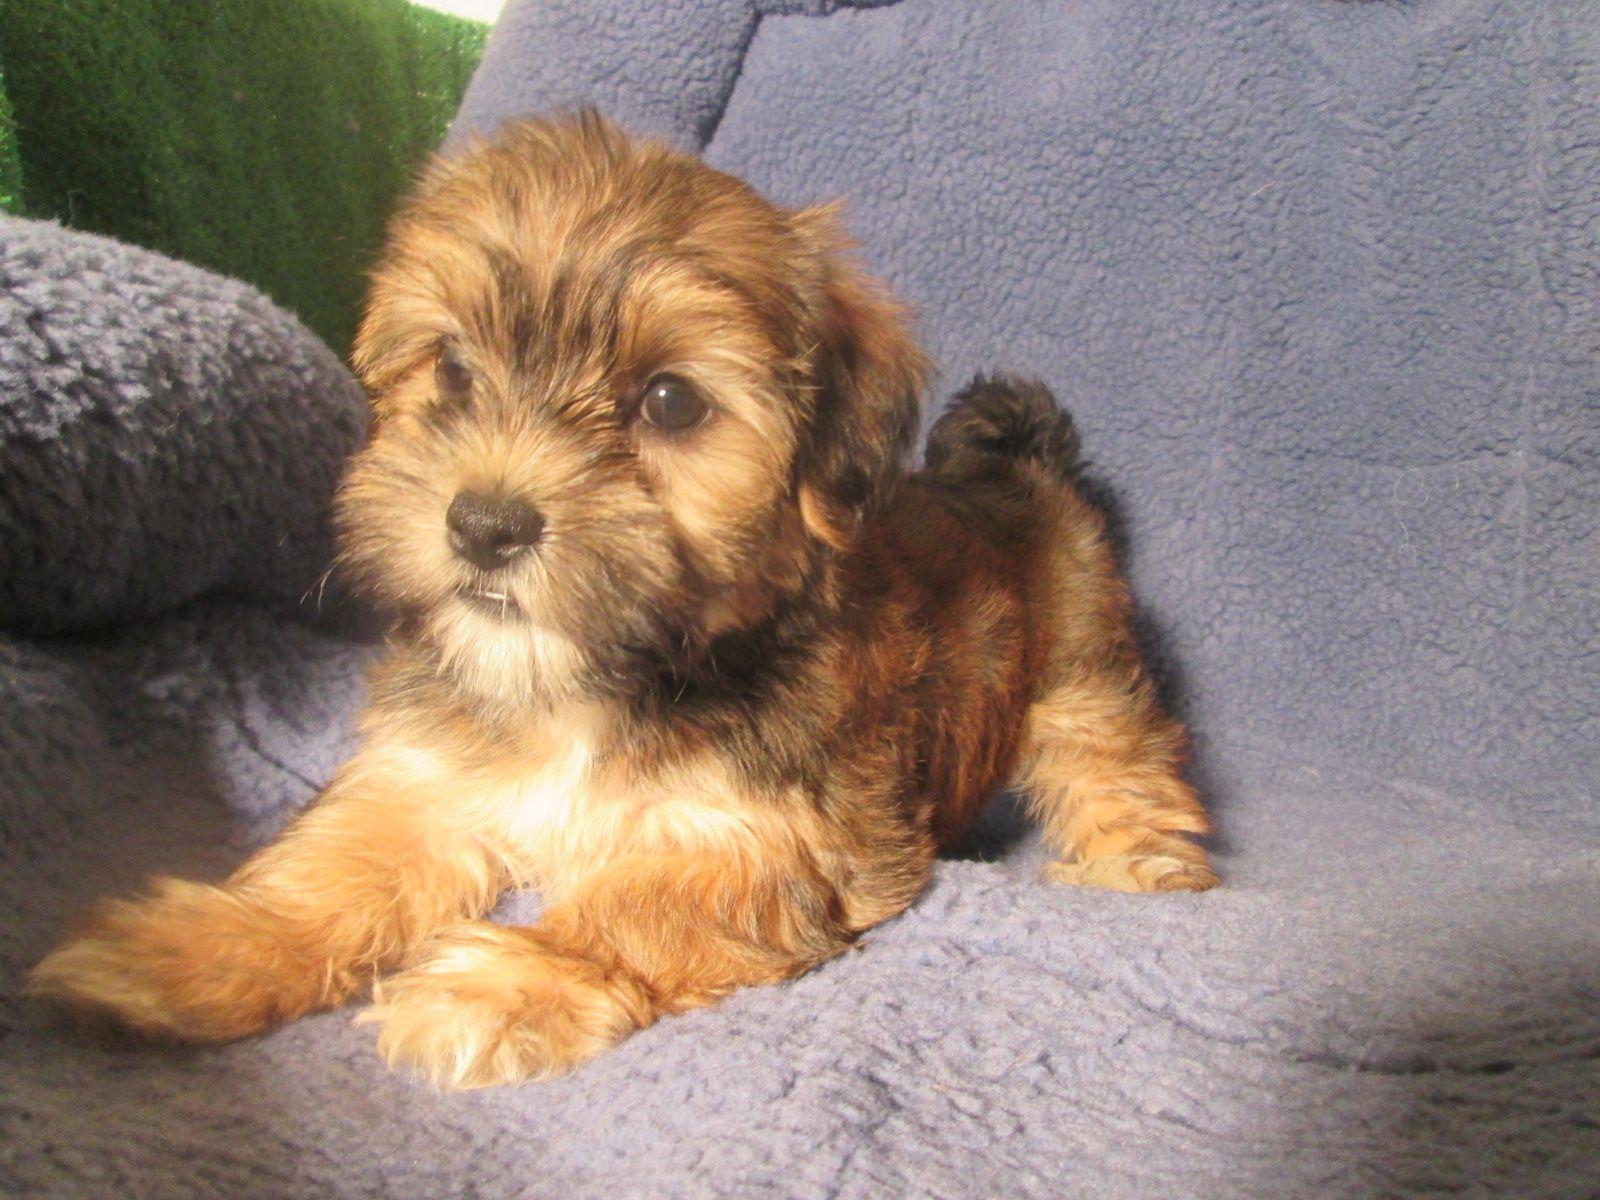 Adorable Yorkie Havanese Puppies Available! *8 12 weeks